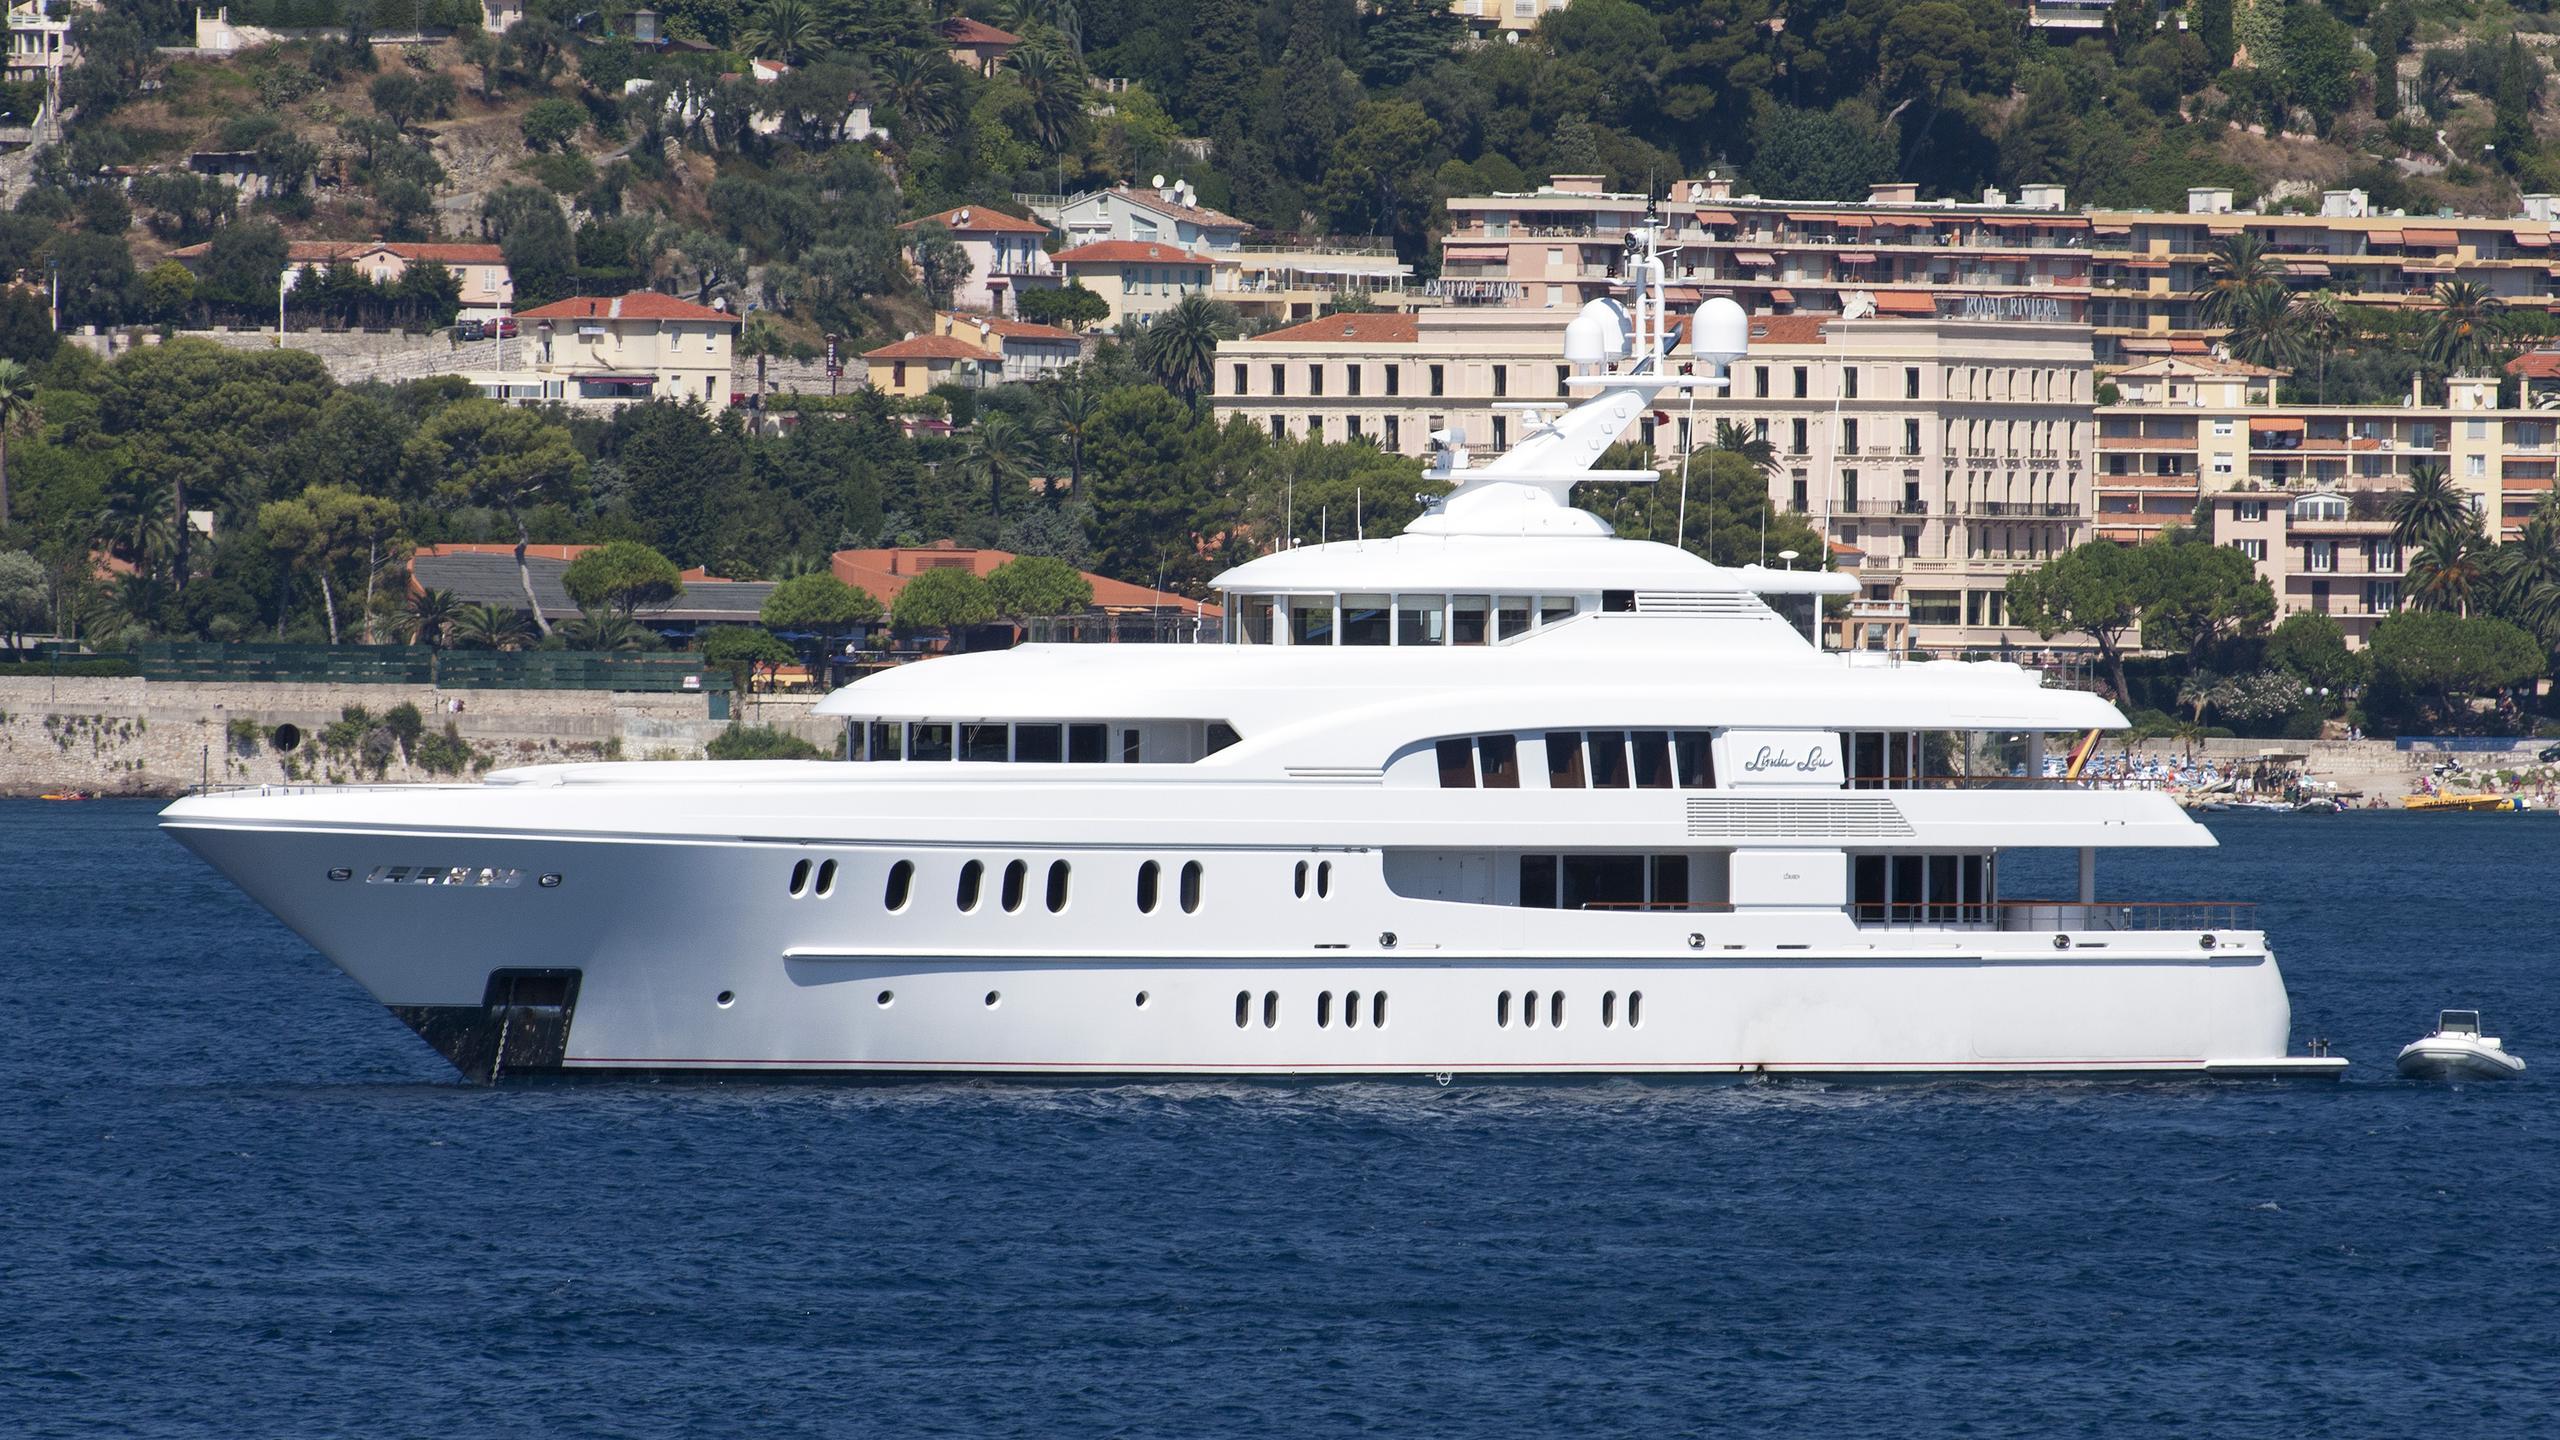 podium-motor-yacht-lurssen-2006-60m-profile-before-refit